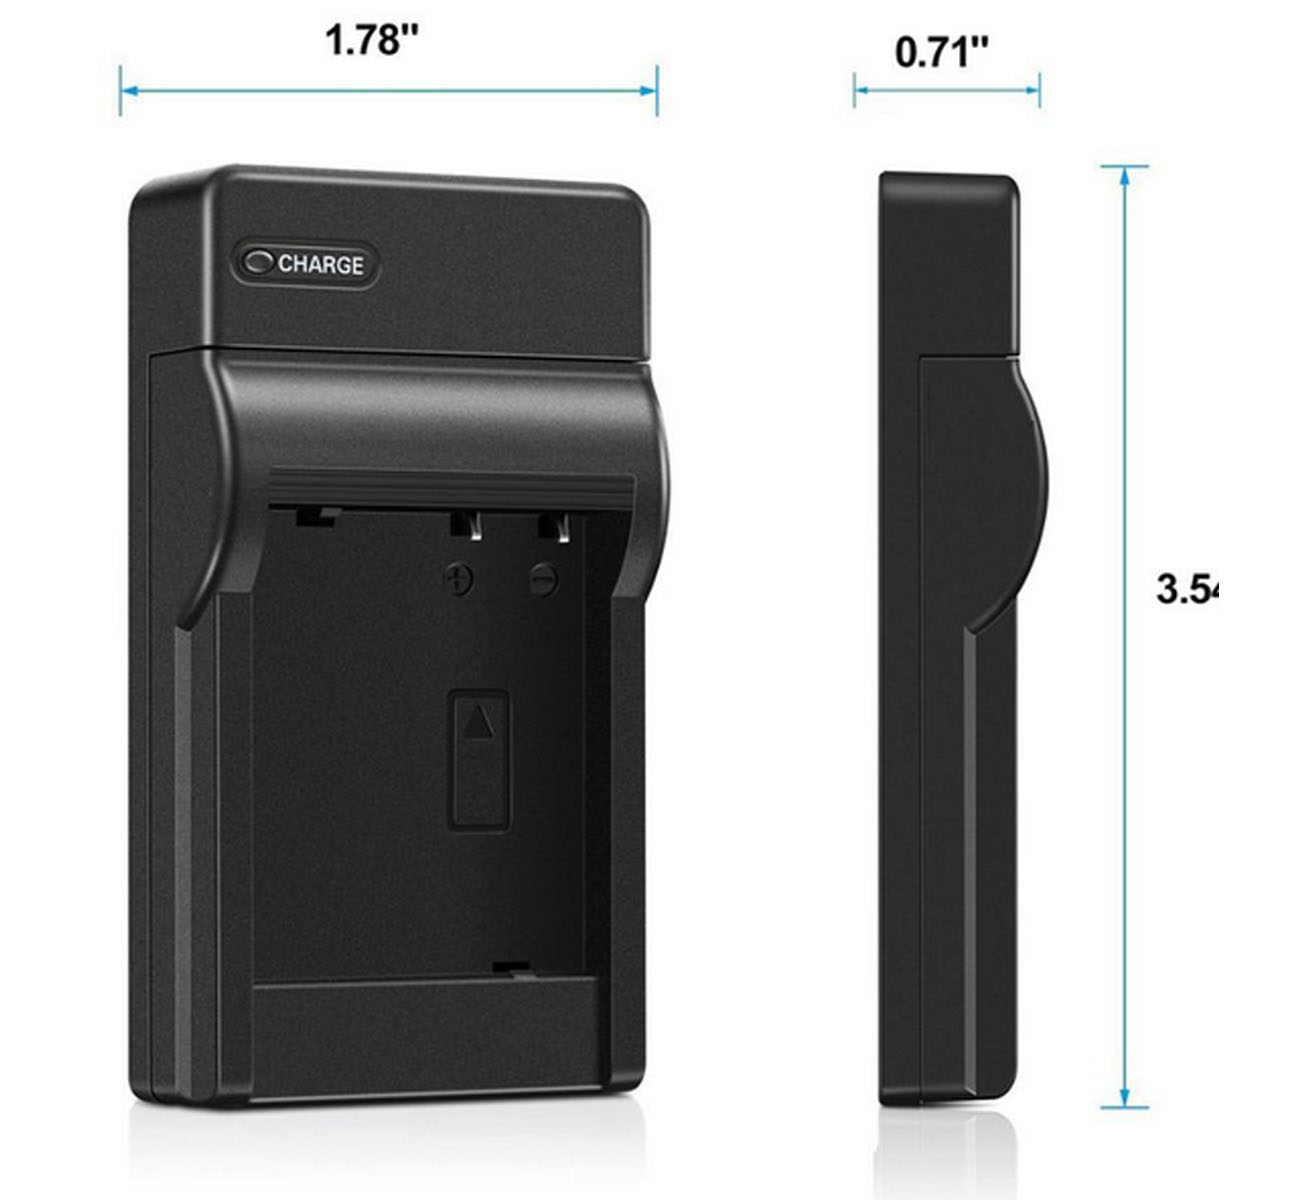 SC-D34 SC-D67 Digital Video Camcorder Battery Pack for Samsung SC-D33 SC-D60 SC-D55 SC-D39